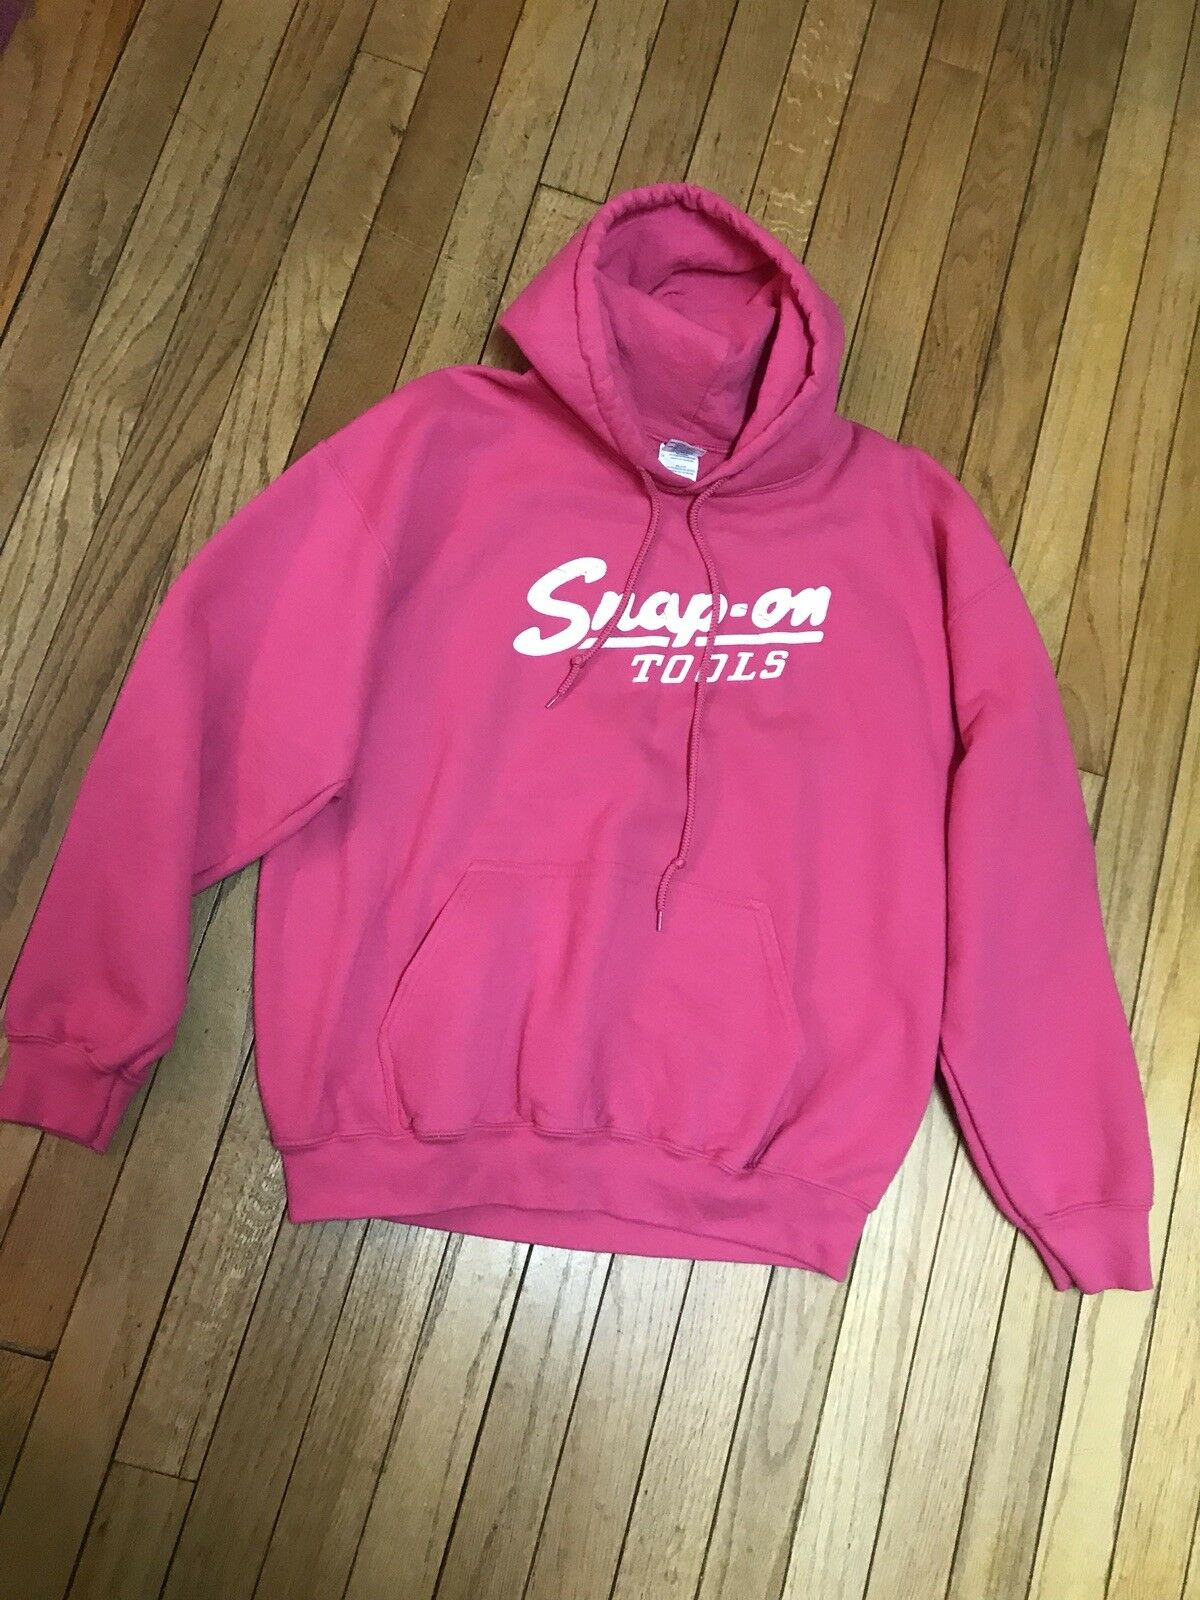 Snap On L XL HOT PINK Hoodie Sweatshirt Long Long Long Sleeve Euc Lkn RARE FIND    75  2d6733